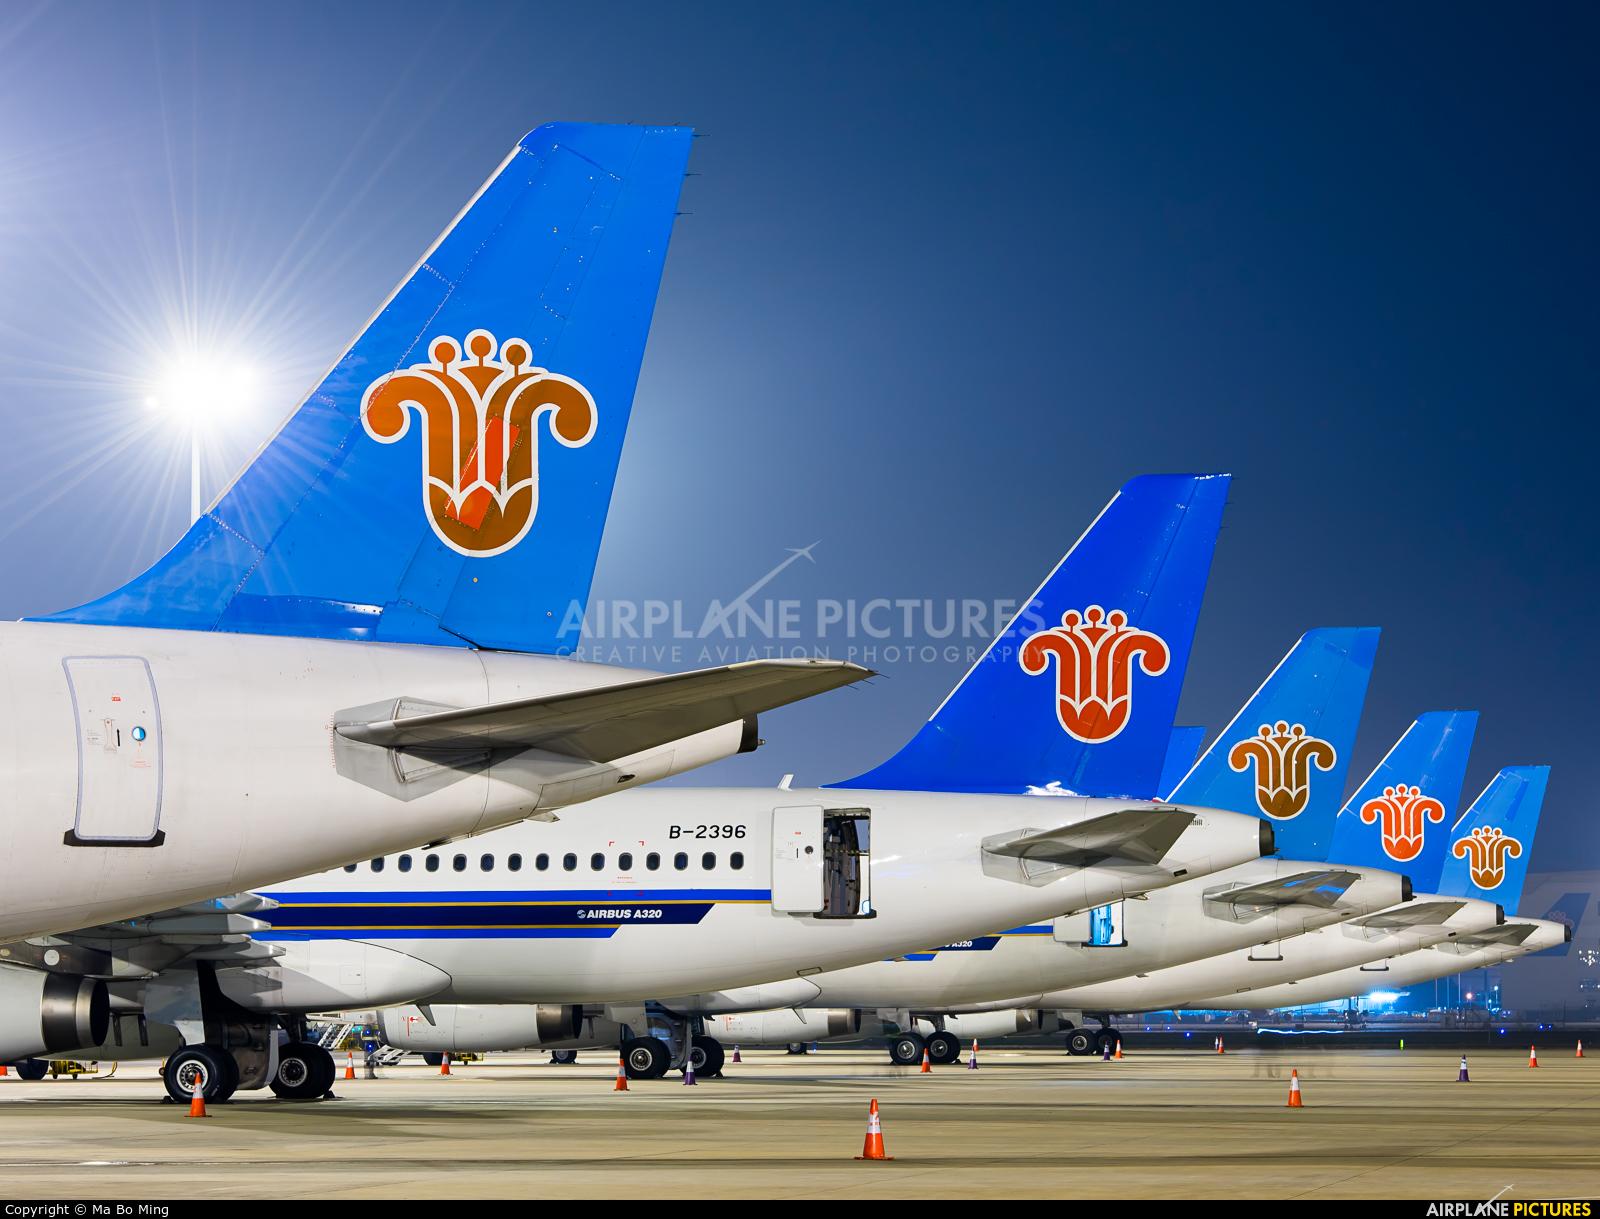 China Southern Airlines B-2369 aircraft at SHENZHEN BAO'AN  int'l airport